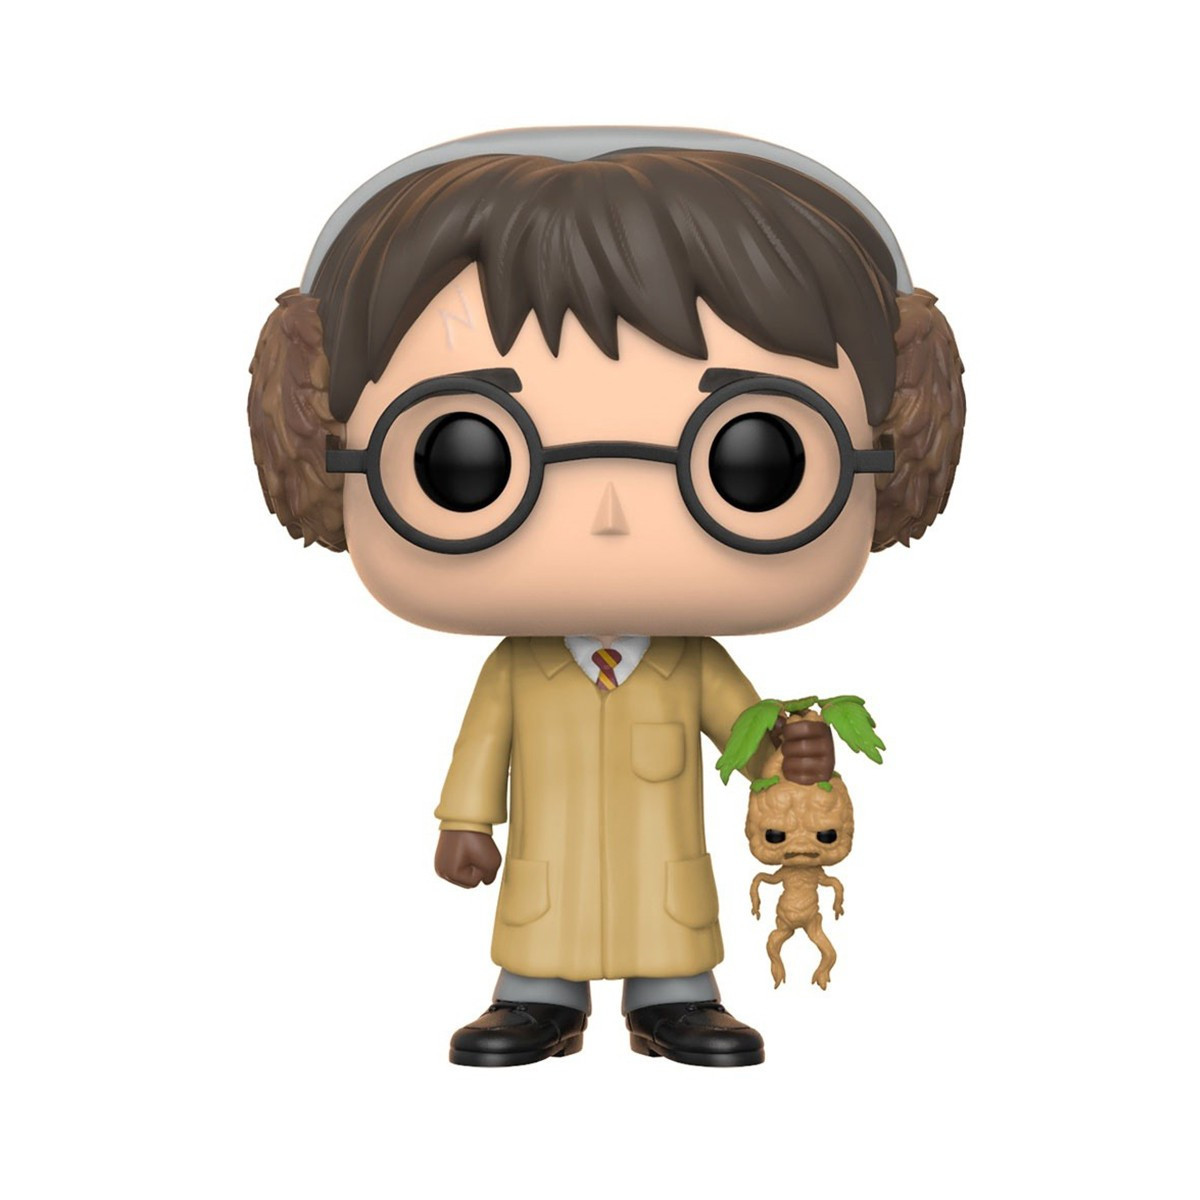 Фигурка Funko Pop серии Гарри Поттер - Гарри Поттер на уроке травологии (29496)